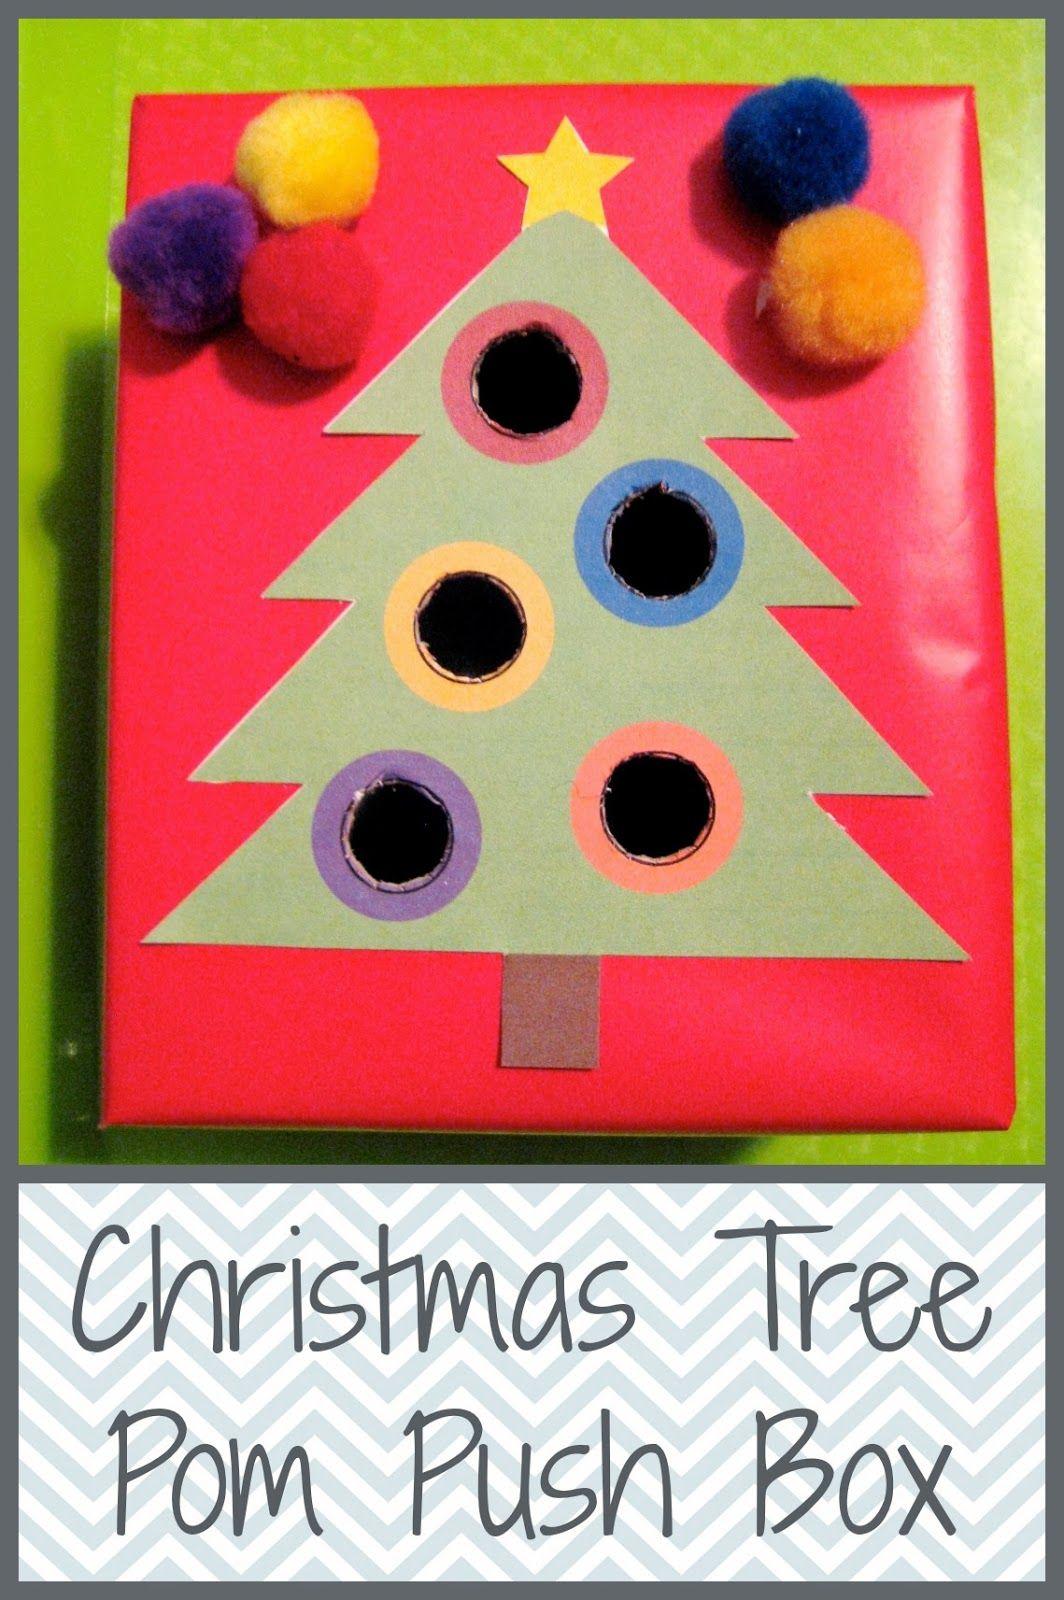 Christmas Tree Push Box Printable